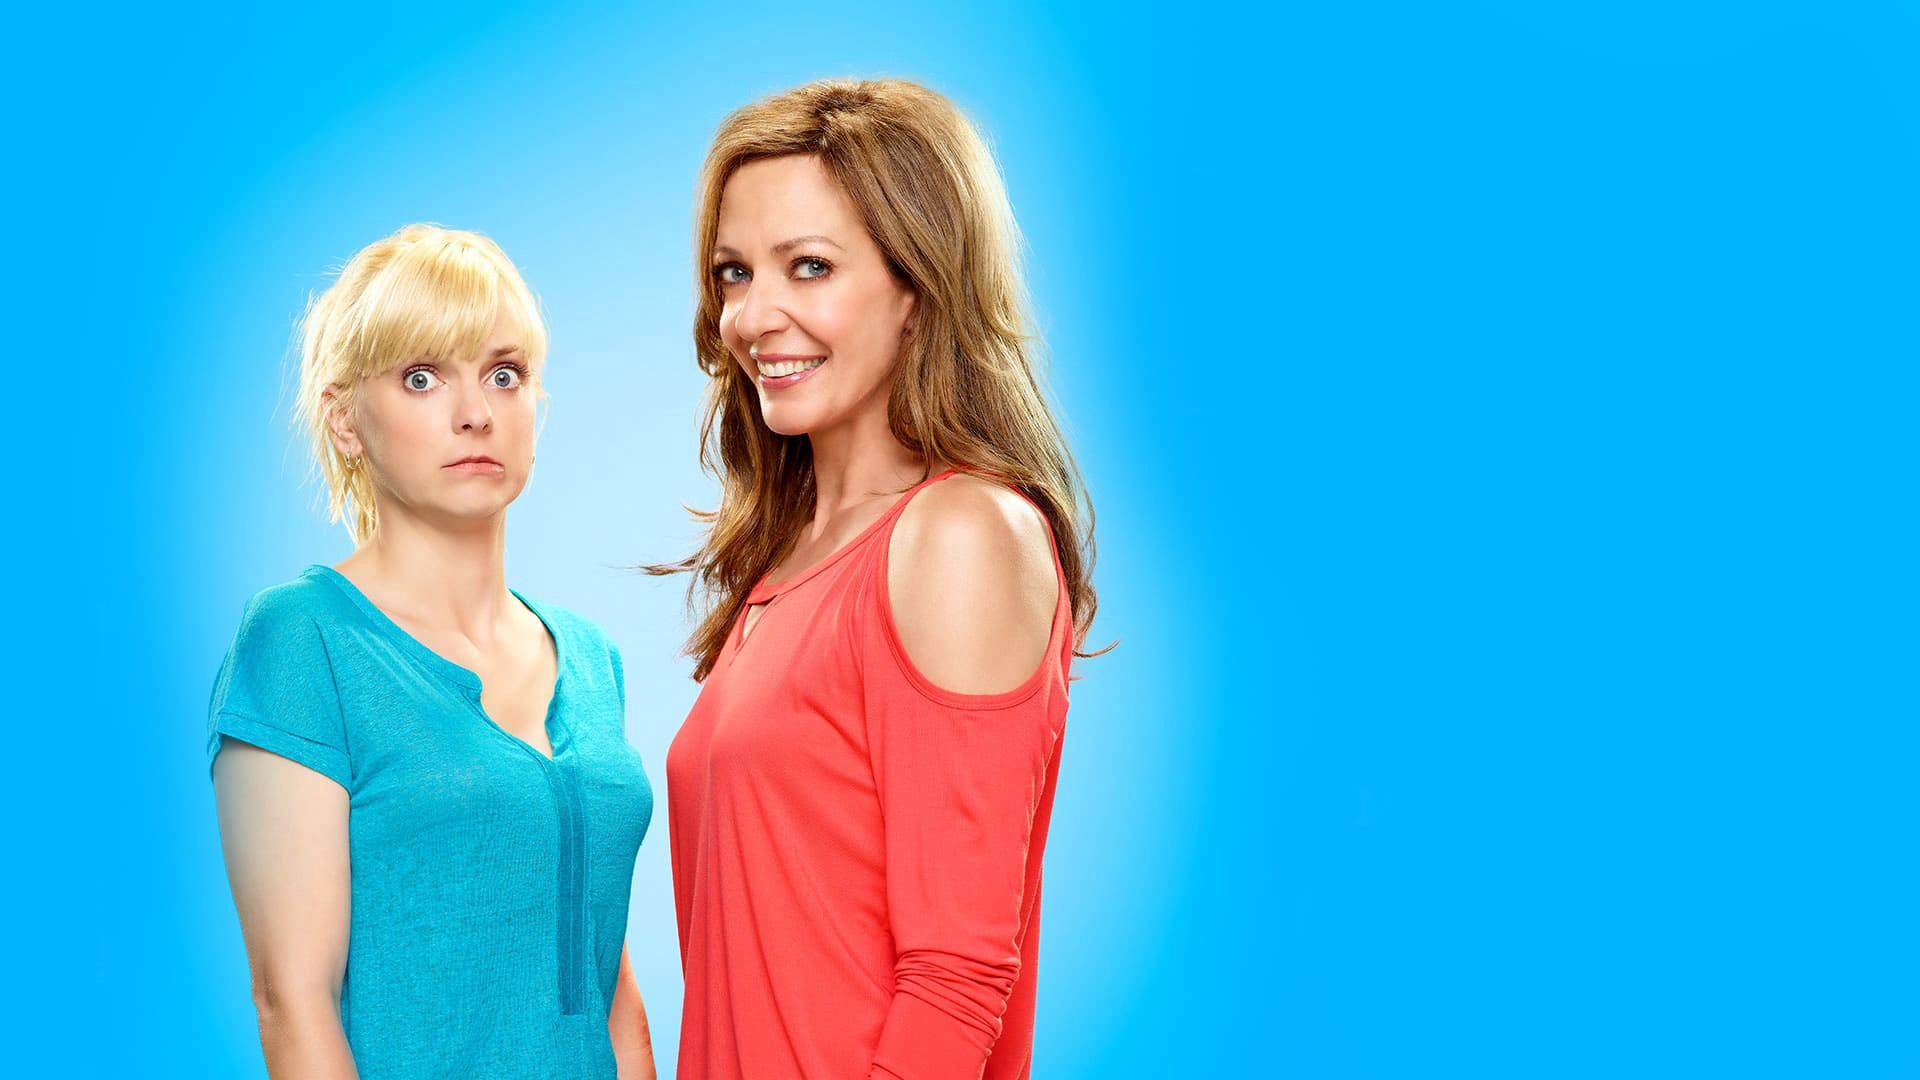 Mom Season 8 Episode 8 Release Date, Preview and Recap